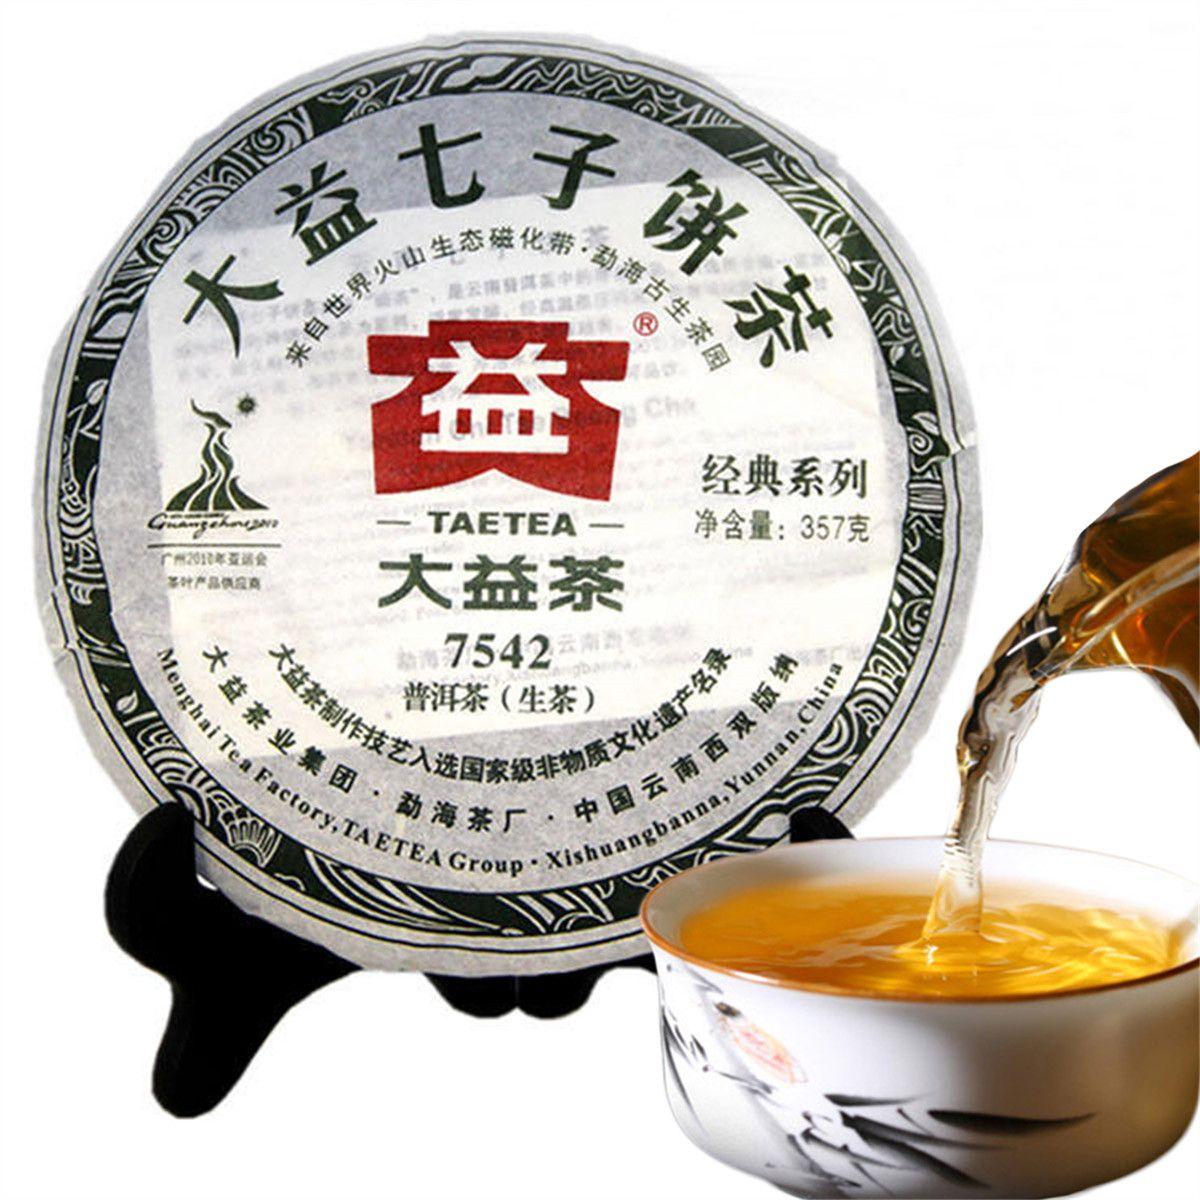 357g del tè di Puerh Cakes Yunnan Dayi 7542 Raw Puerh tè verde cinese Pu erh Healthy Green Food Preferenze